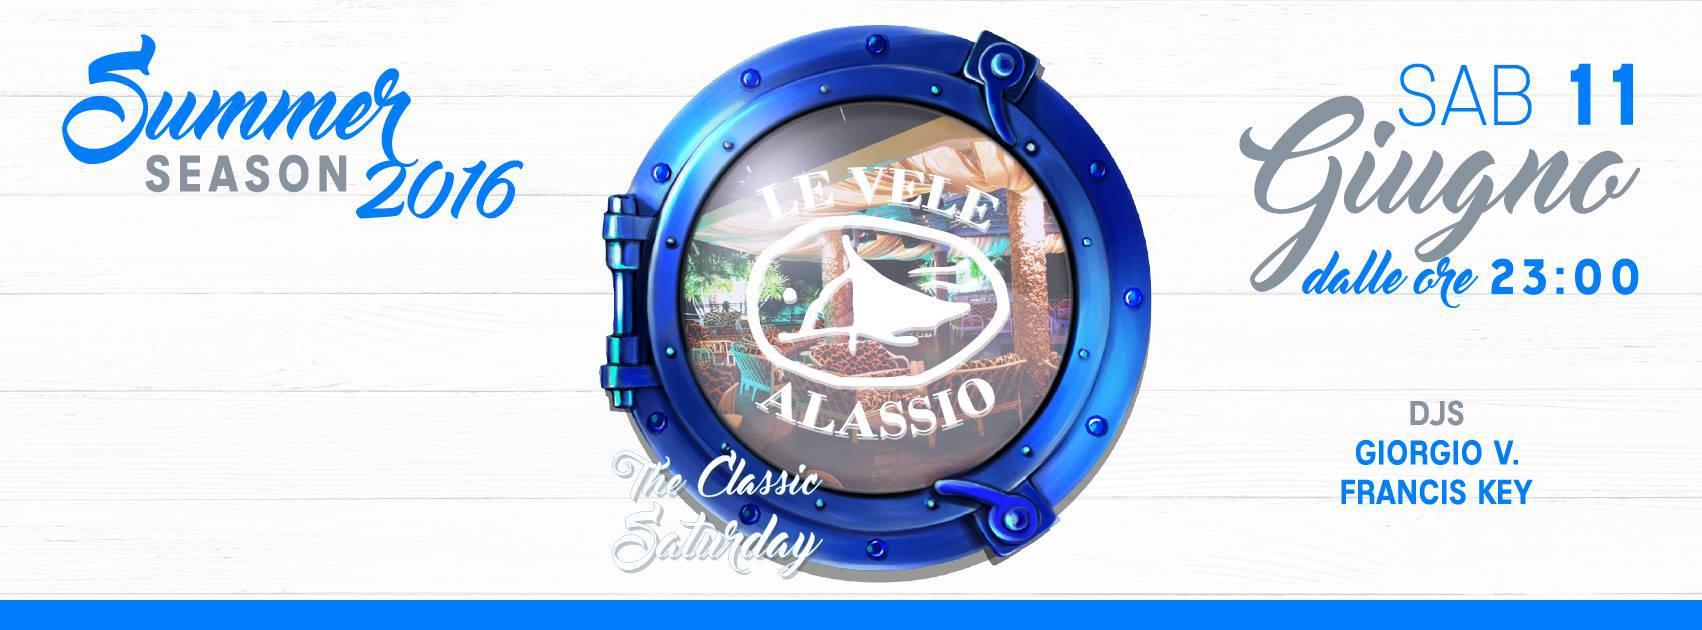 "The Classic Saturday Discoteca ""Le Vele"" Alassio"